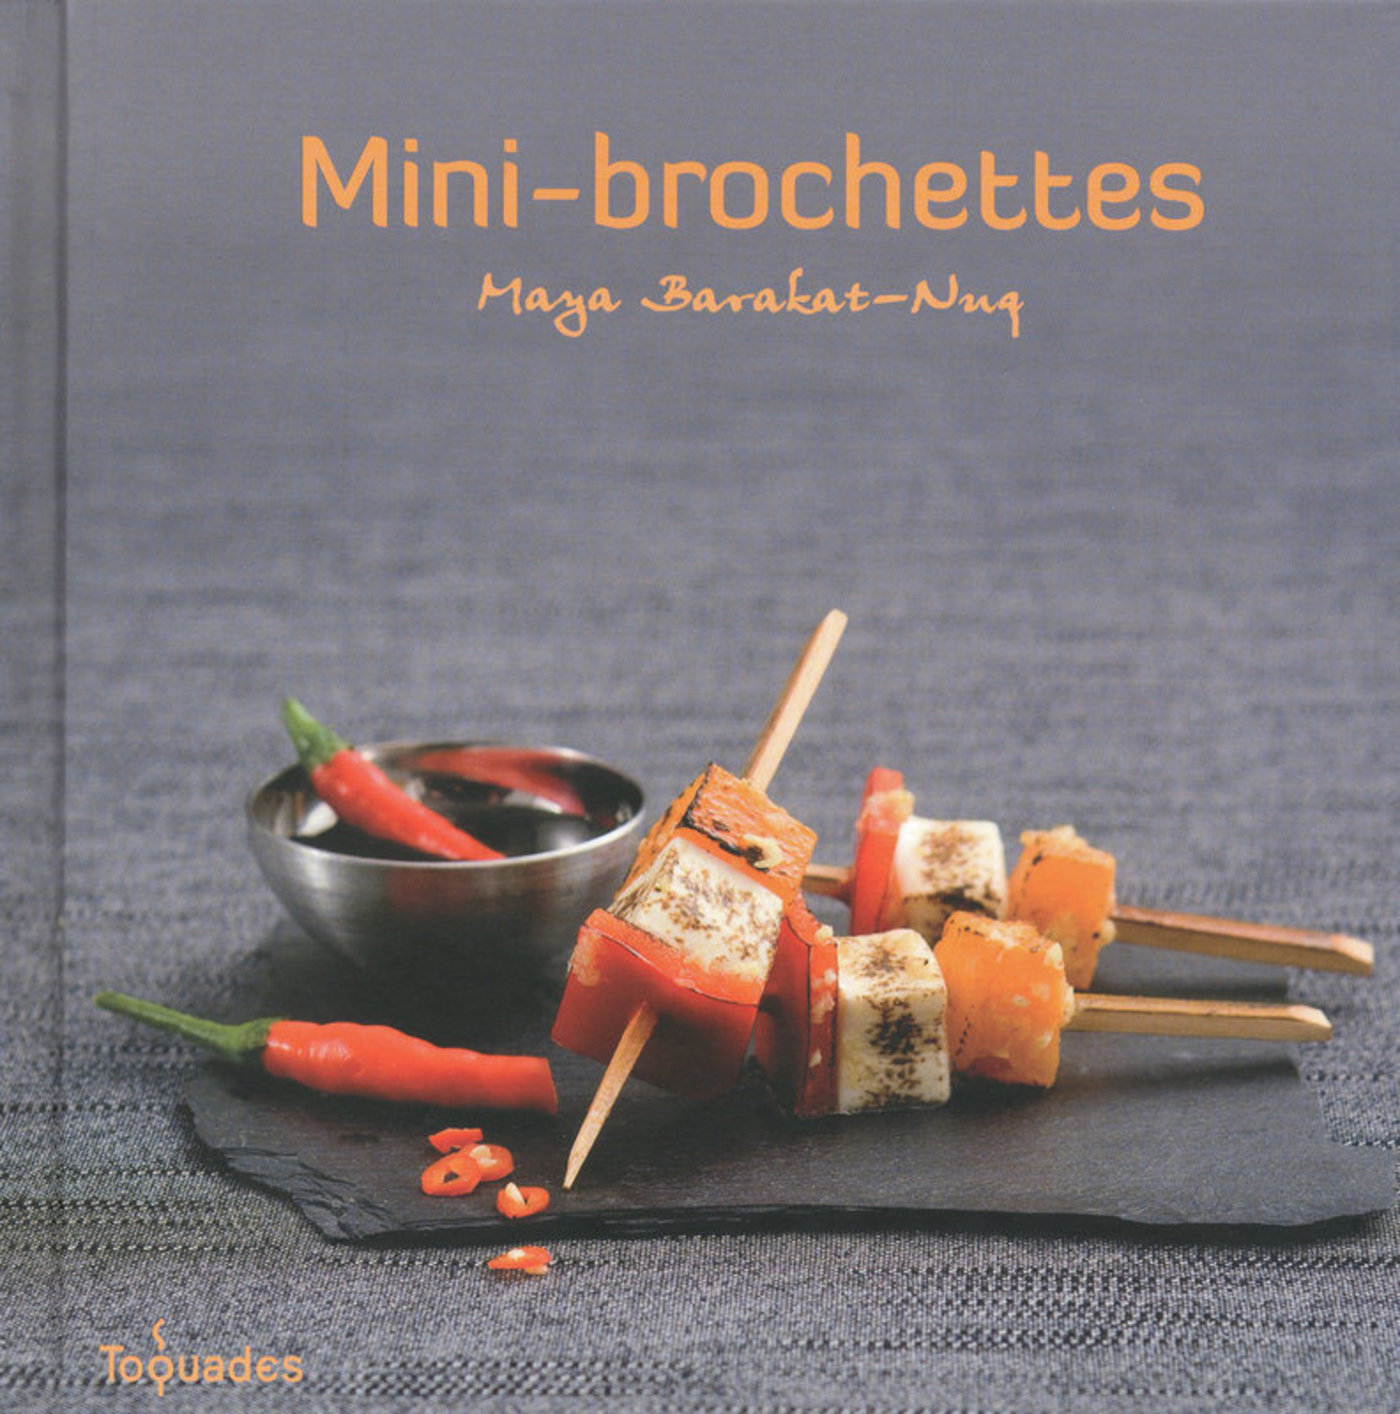 Mini-brochettes